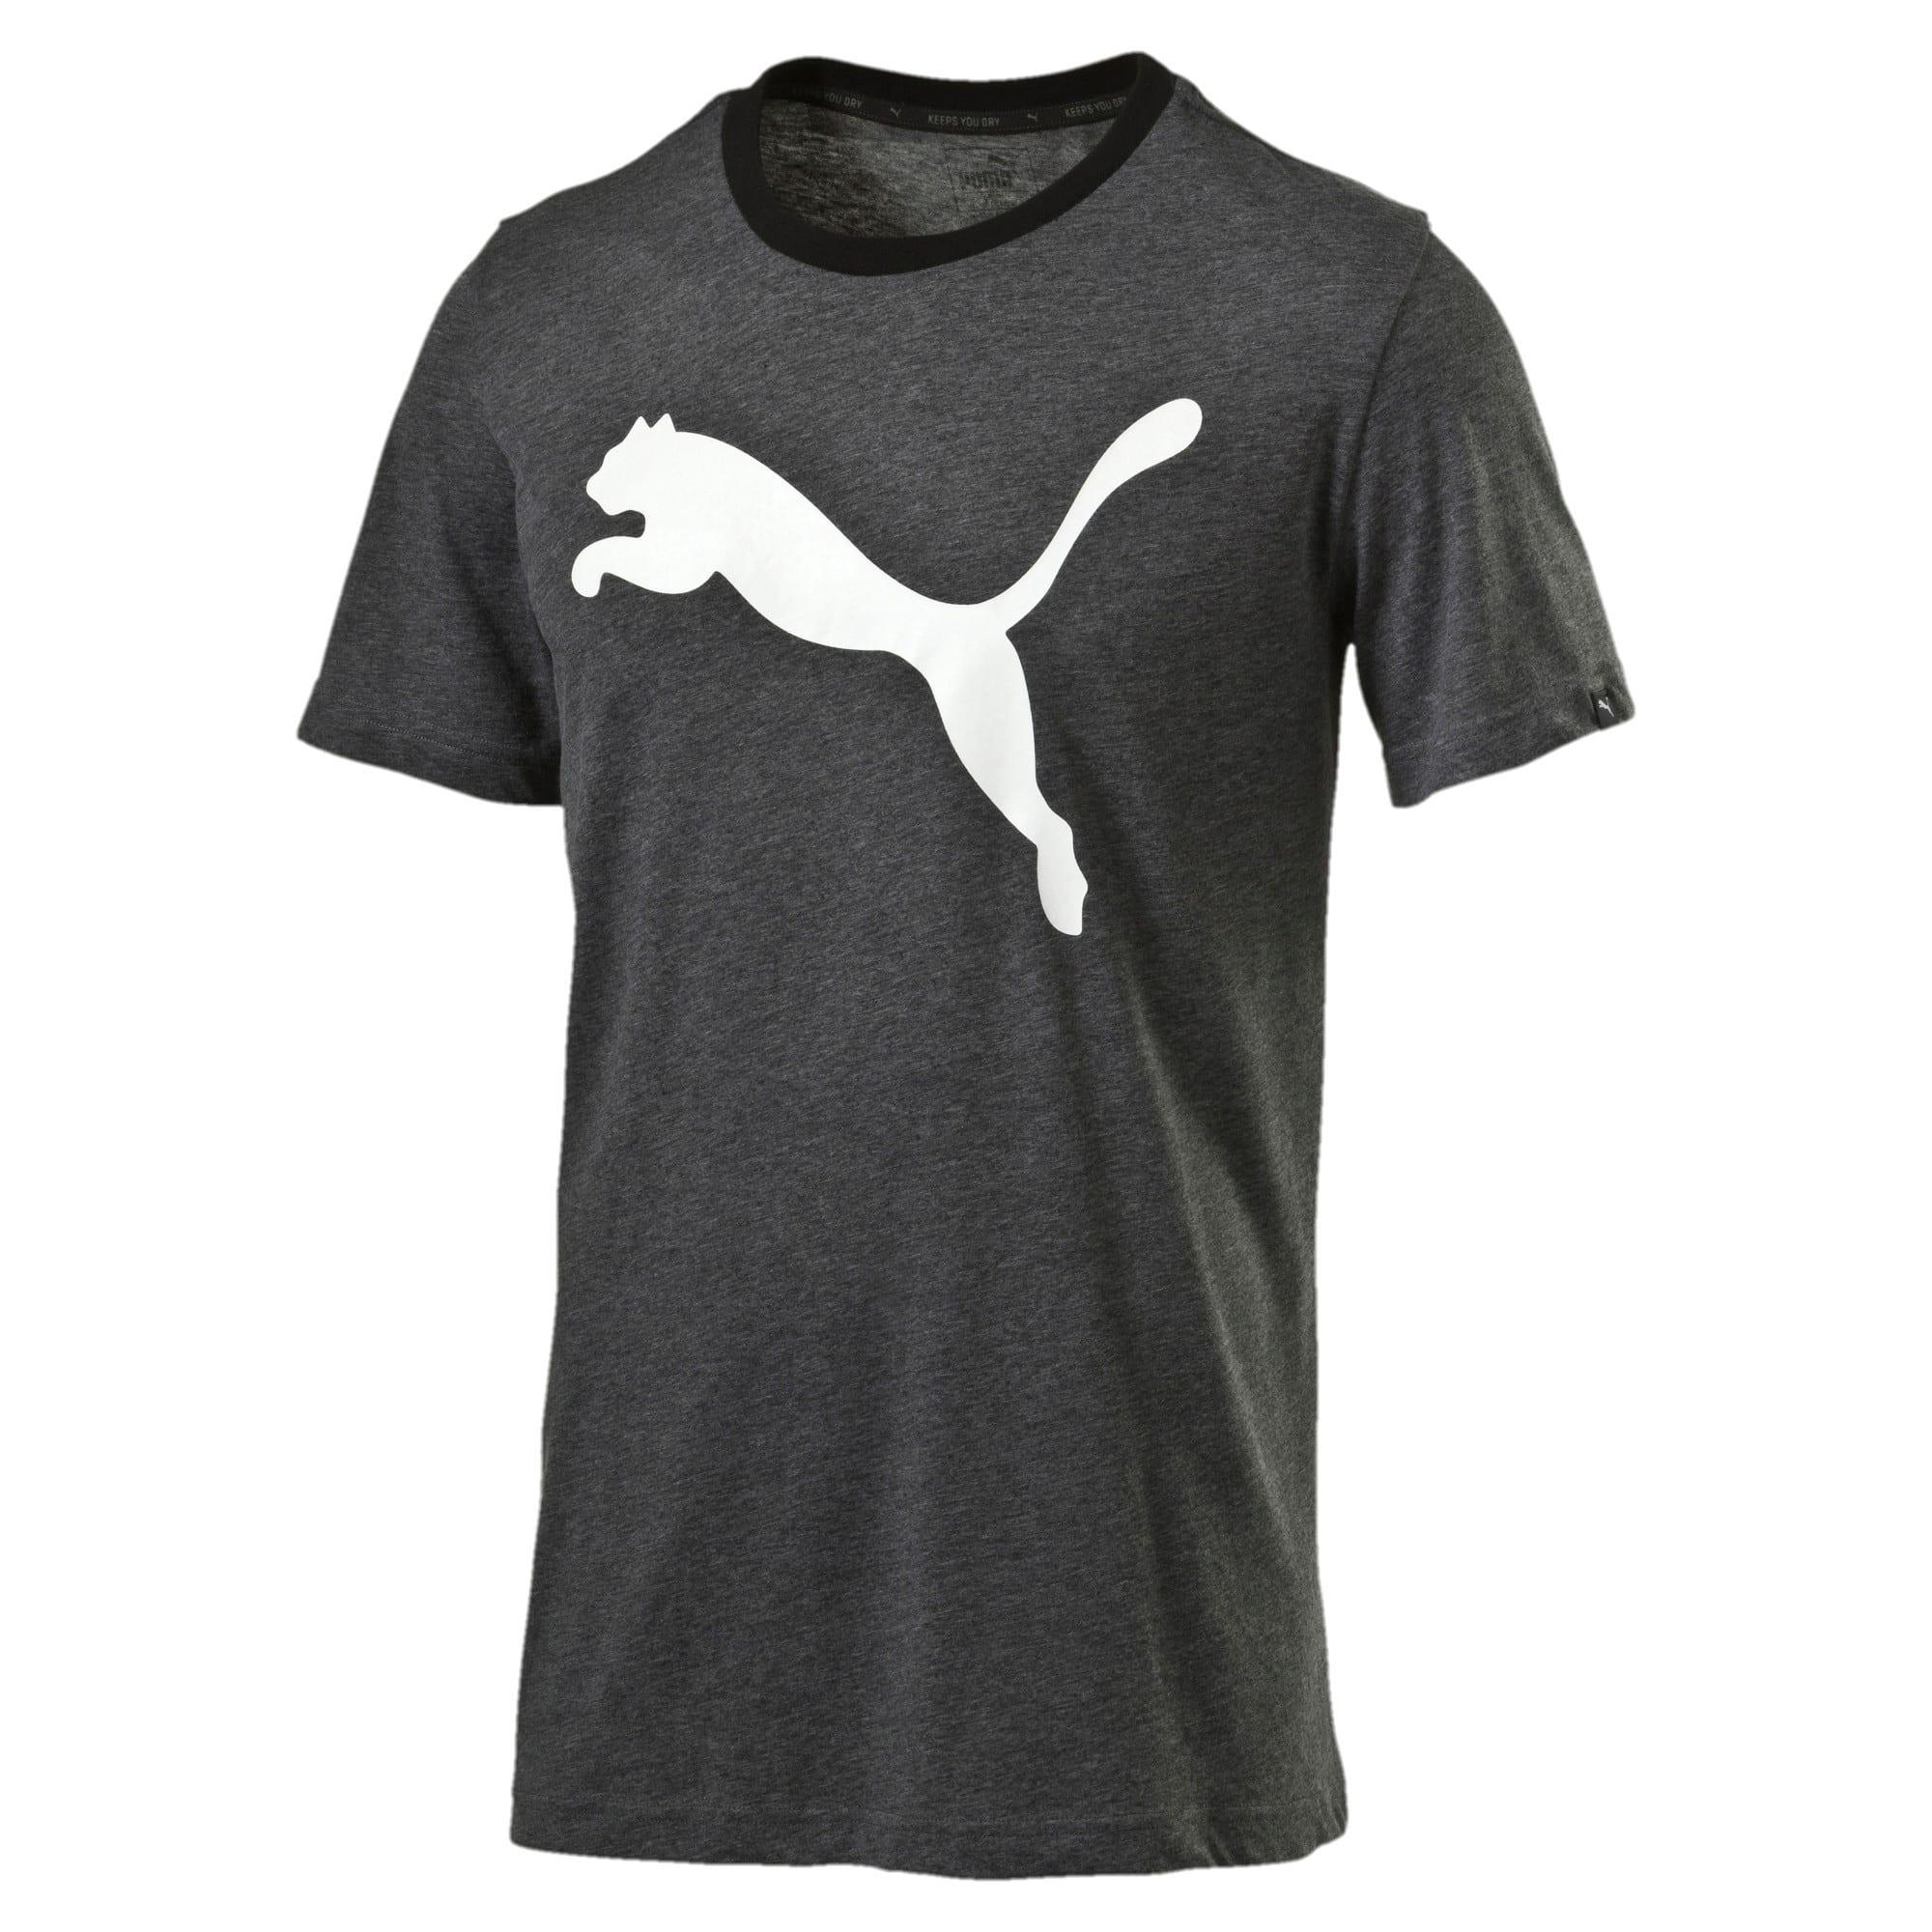 Thumbnail 4 of Men's Big Cat Heather T-Shirt, Puma Black Heather, medium-IND